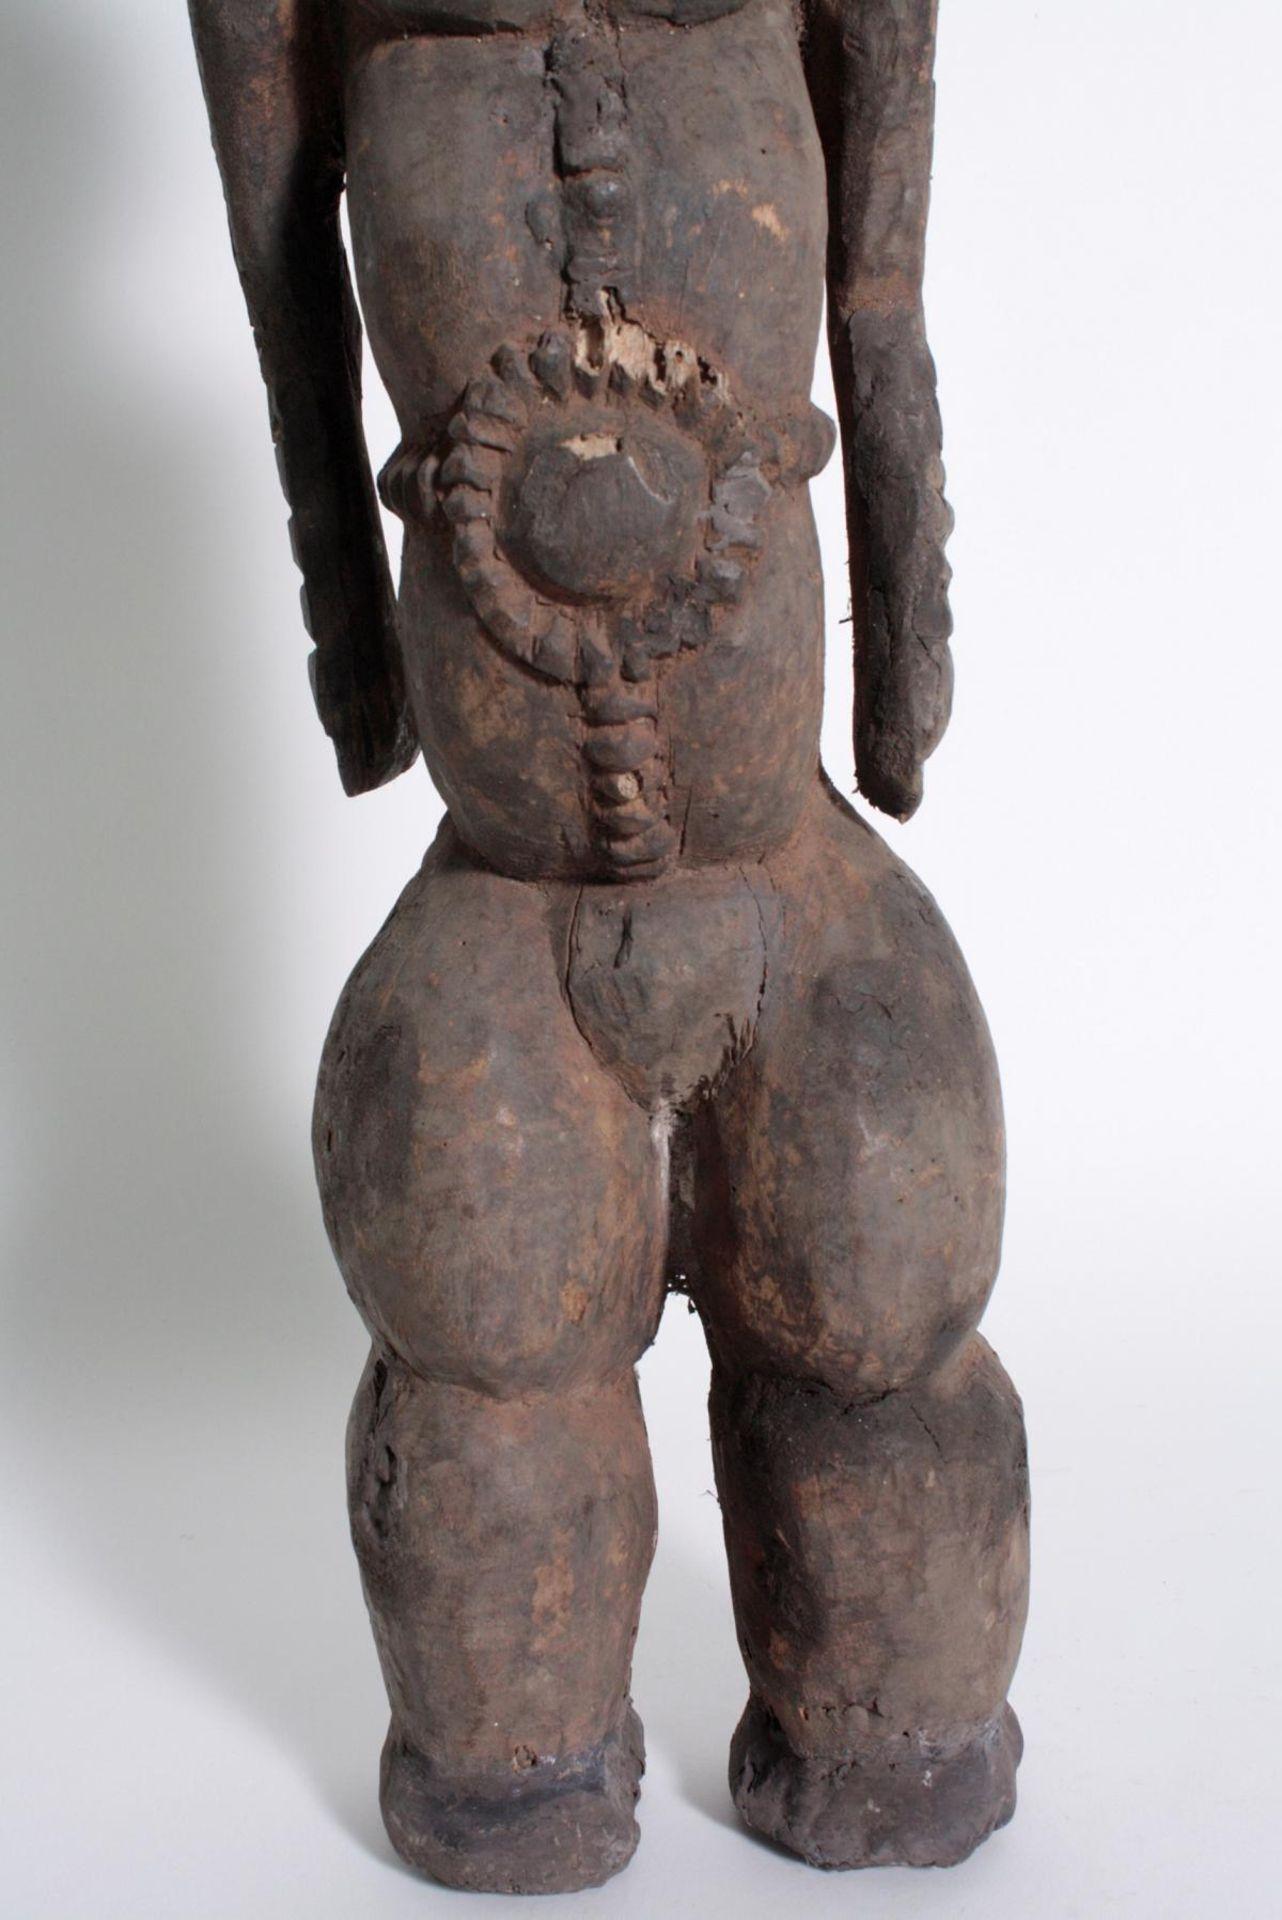 Ältere Ahnen-Figur, Tabwa, D. R. Kongo - Bild 3 aus 14